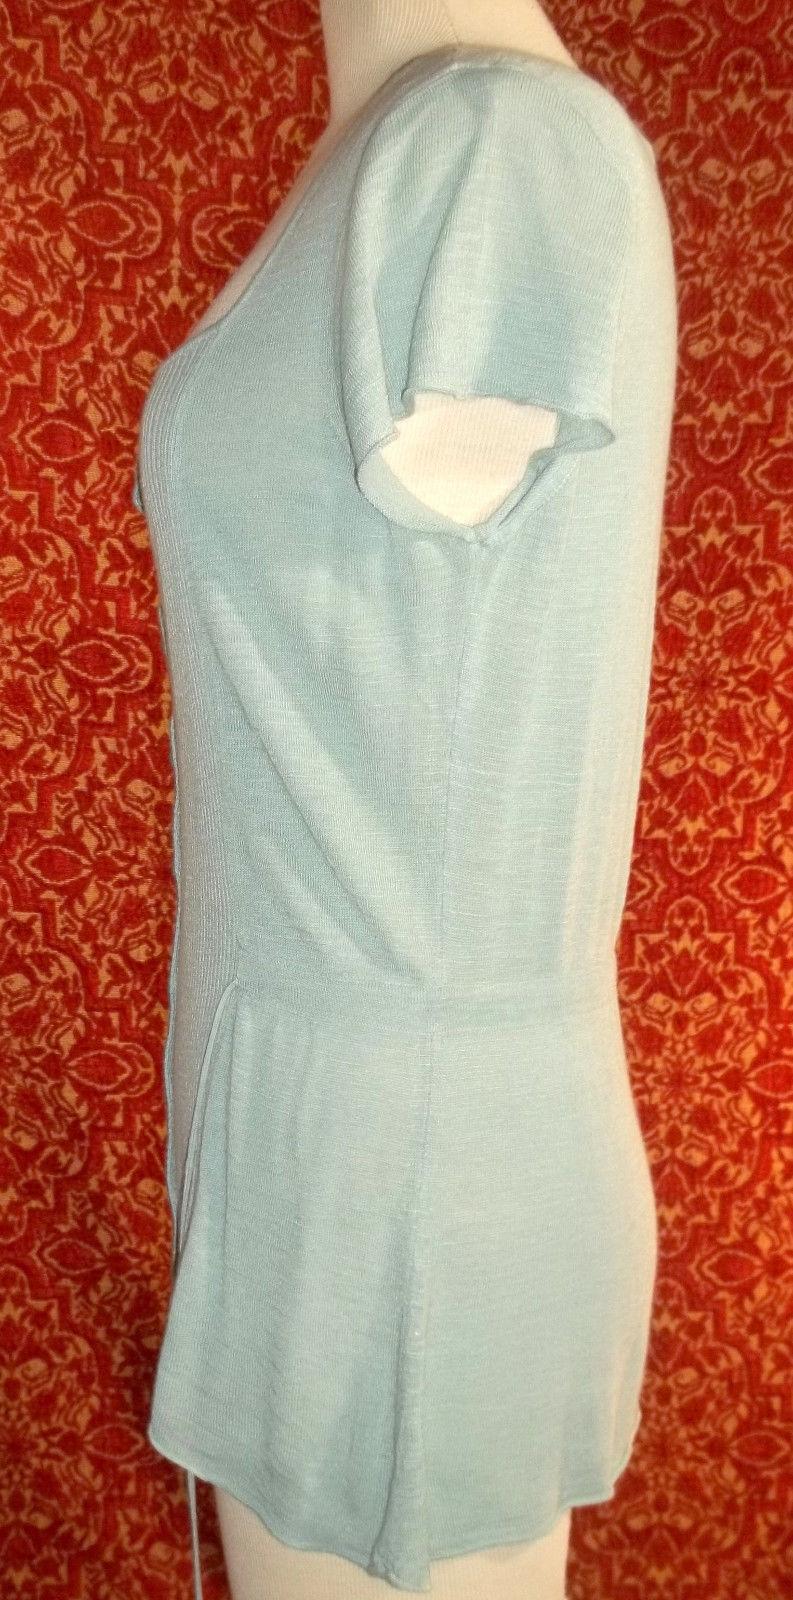 NWT ALFANI soft rayon blend sea foam green cap sleeve tunic blouse M (T17X3B8G)